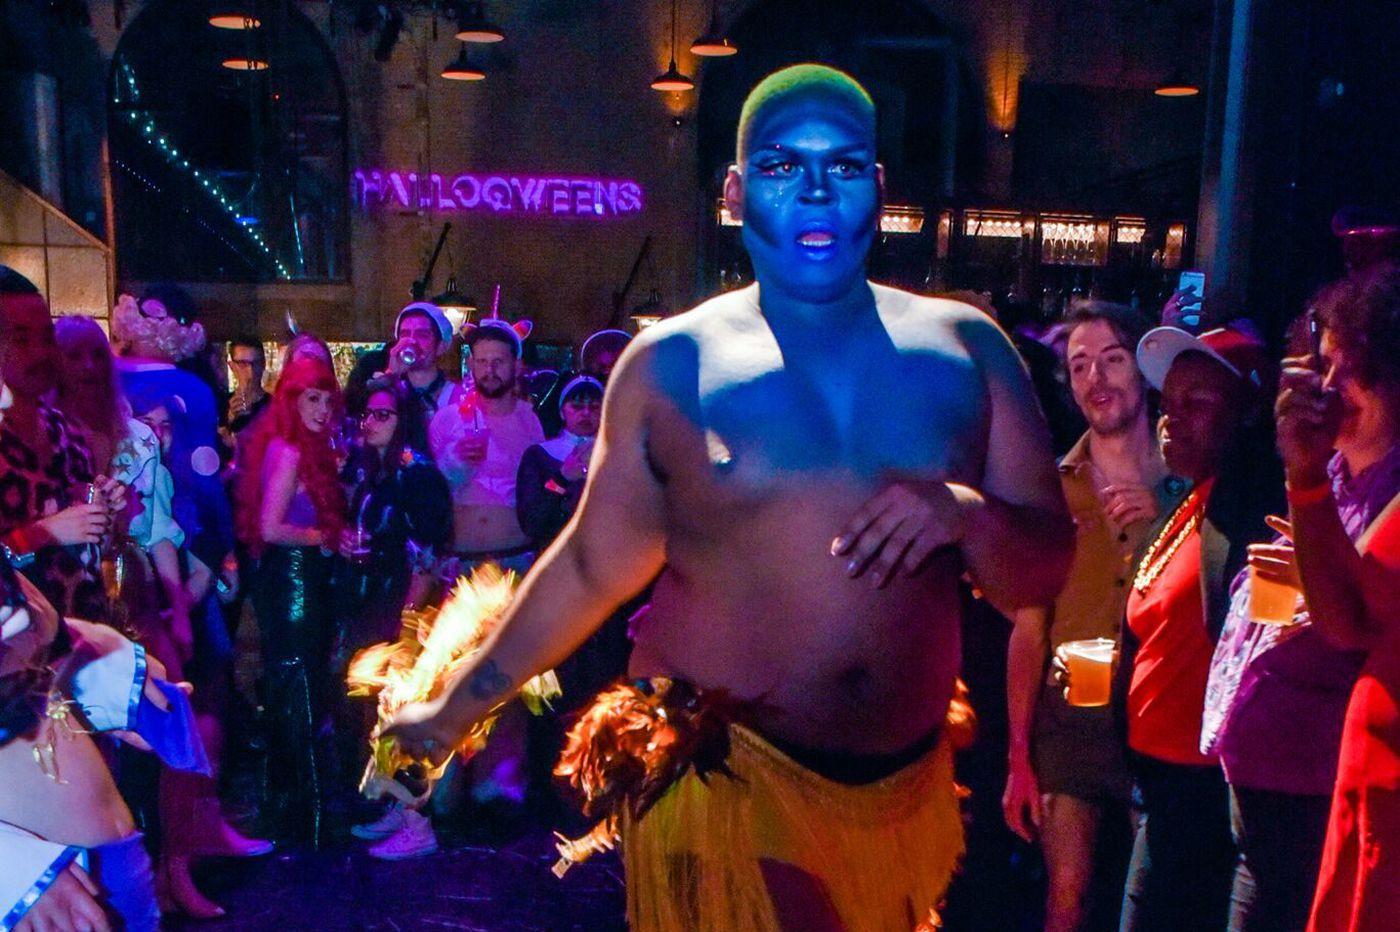 'We deserve more': LGBTQ+ party Halloqweens goes big at FringeArts